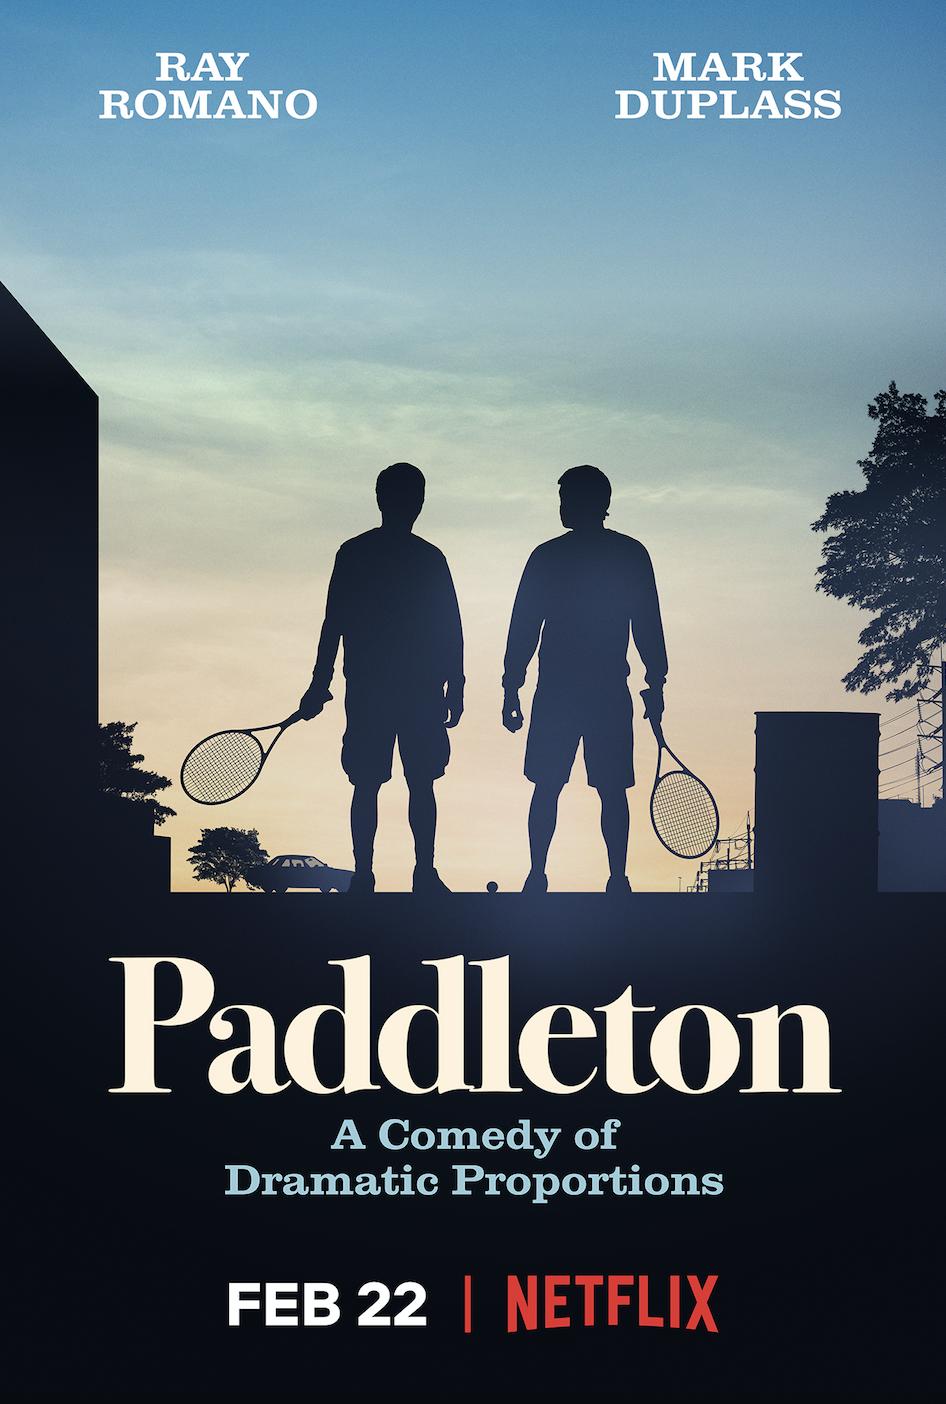 Paddleton: il trailer del film con Ray Romano e Mark Duplass thumbnail